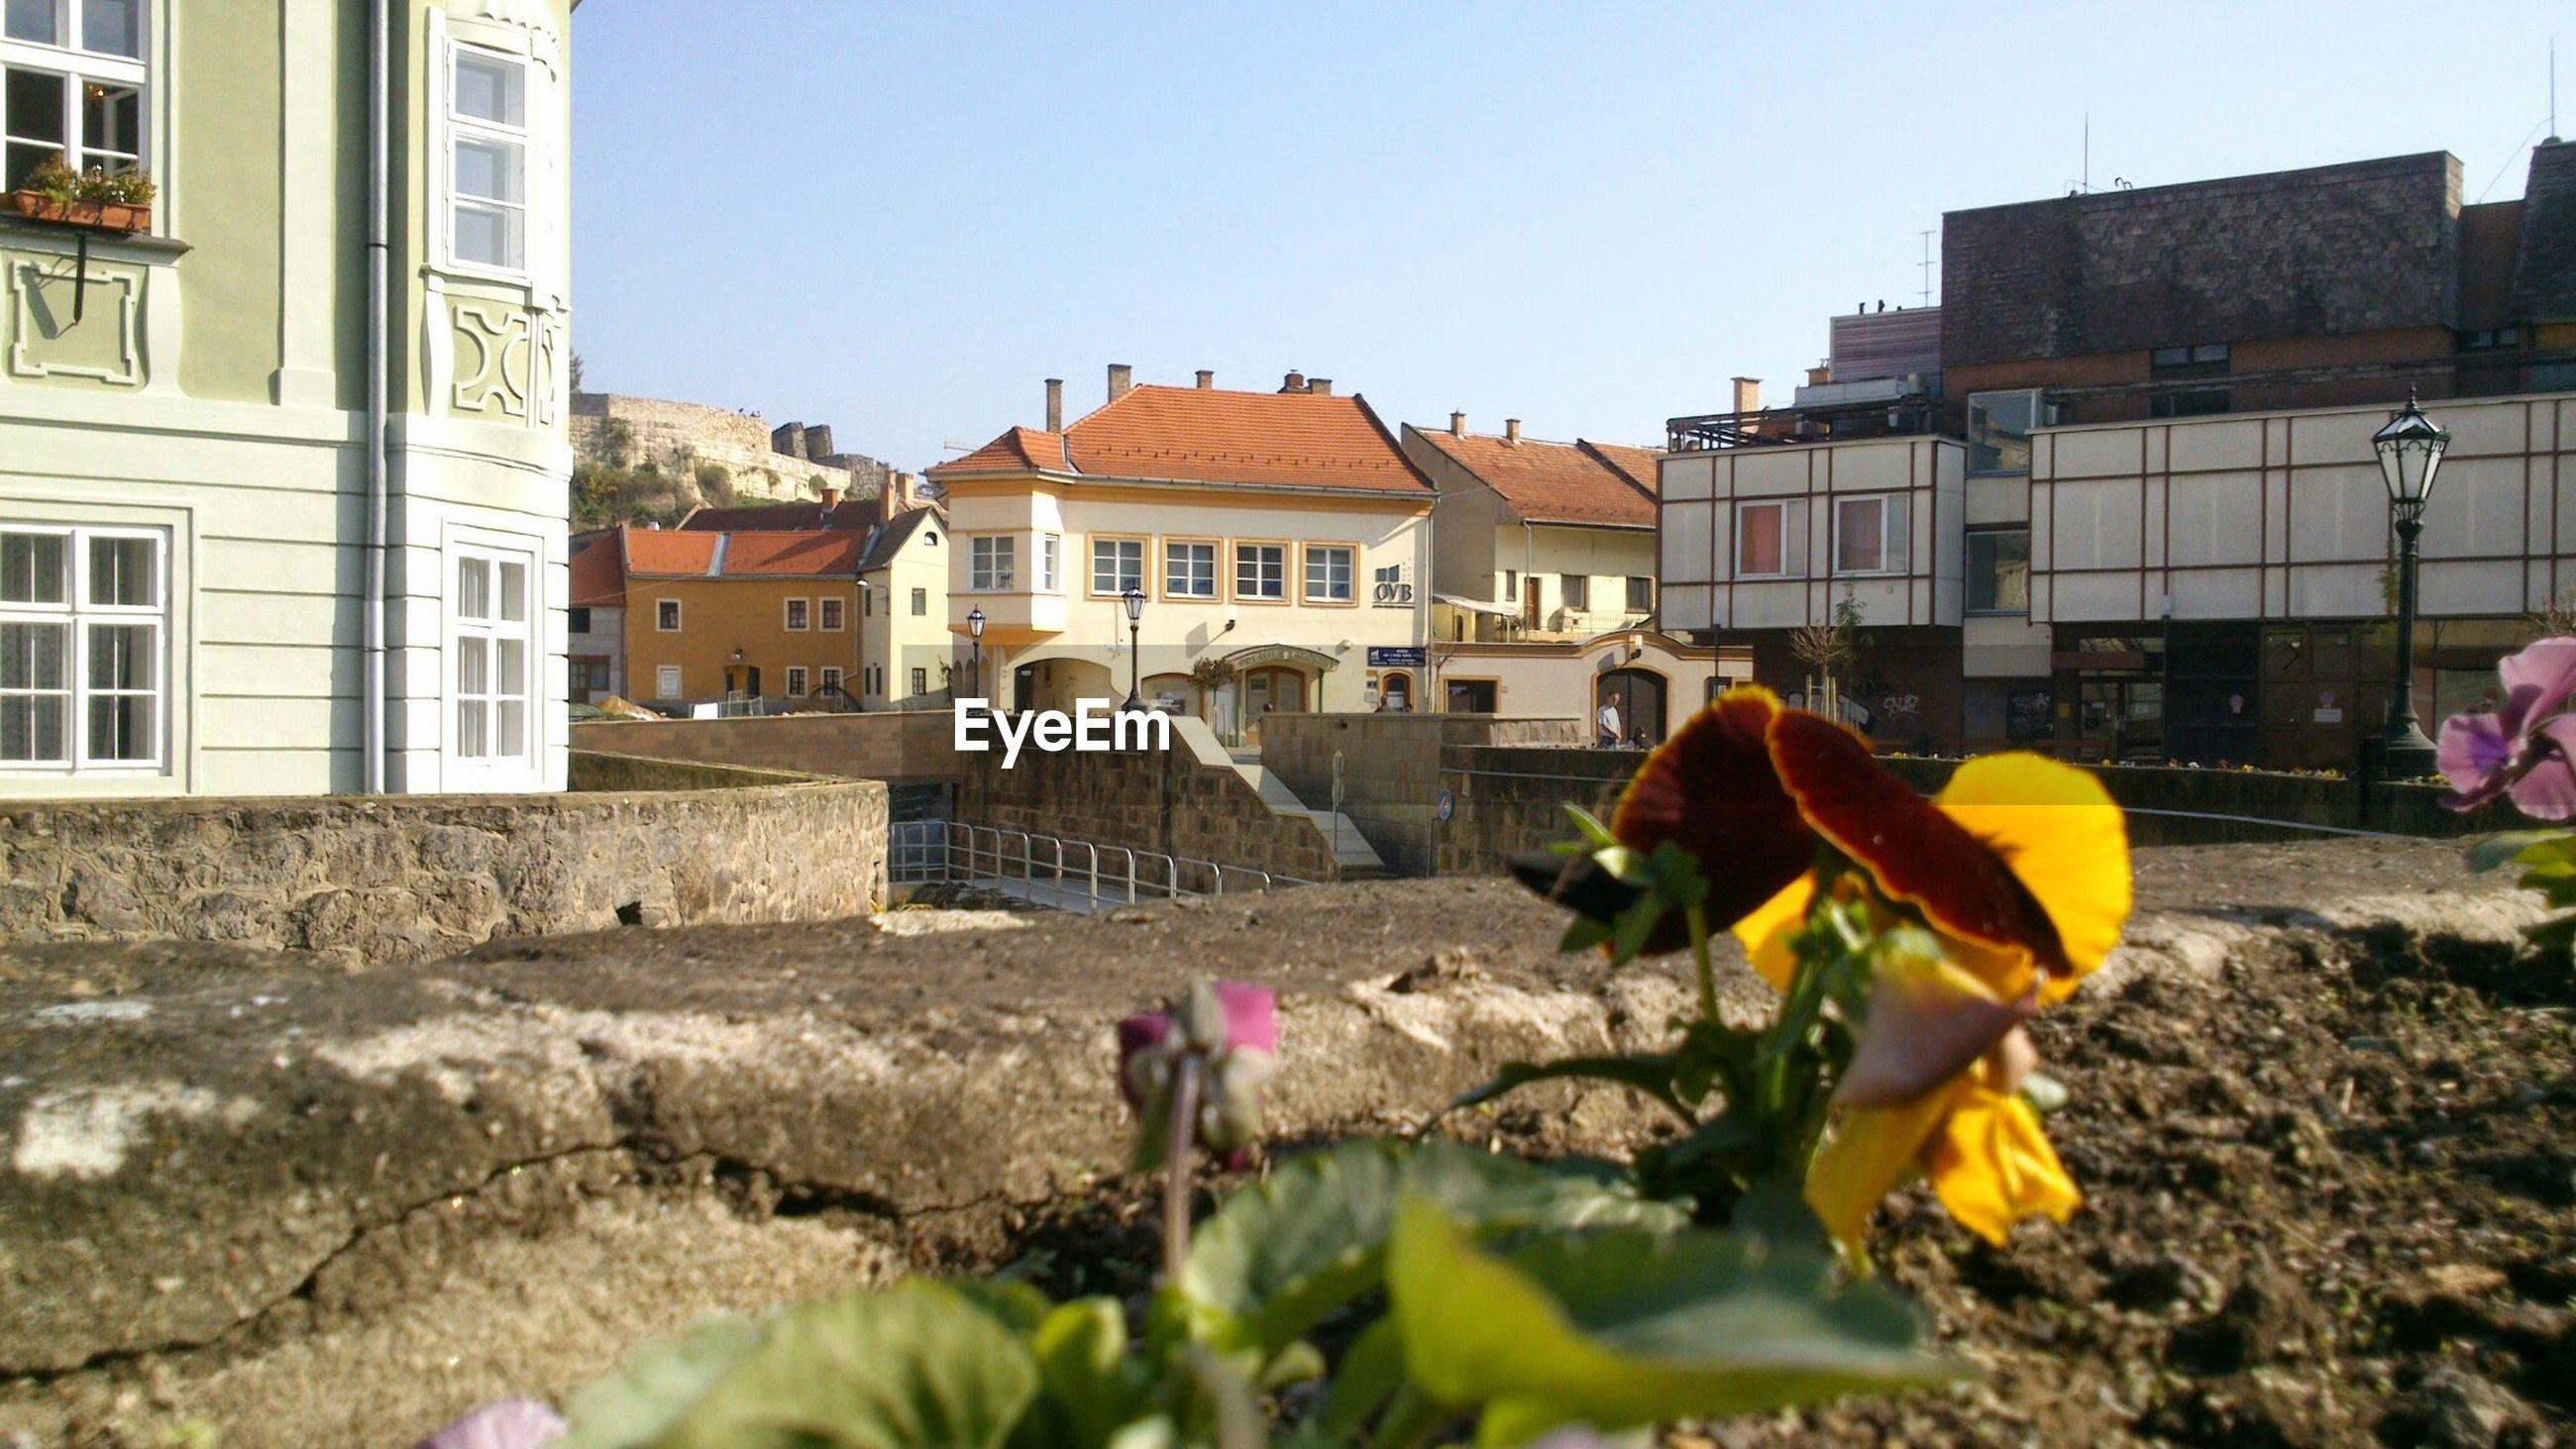 VIEW OF BUILDINGS IN TOWN